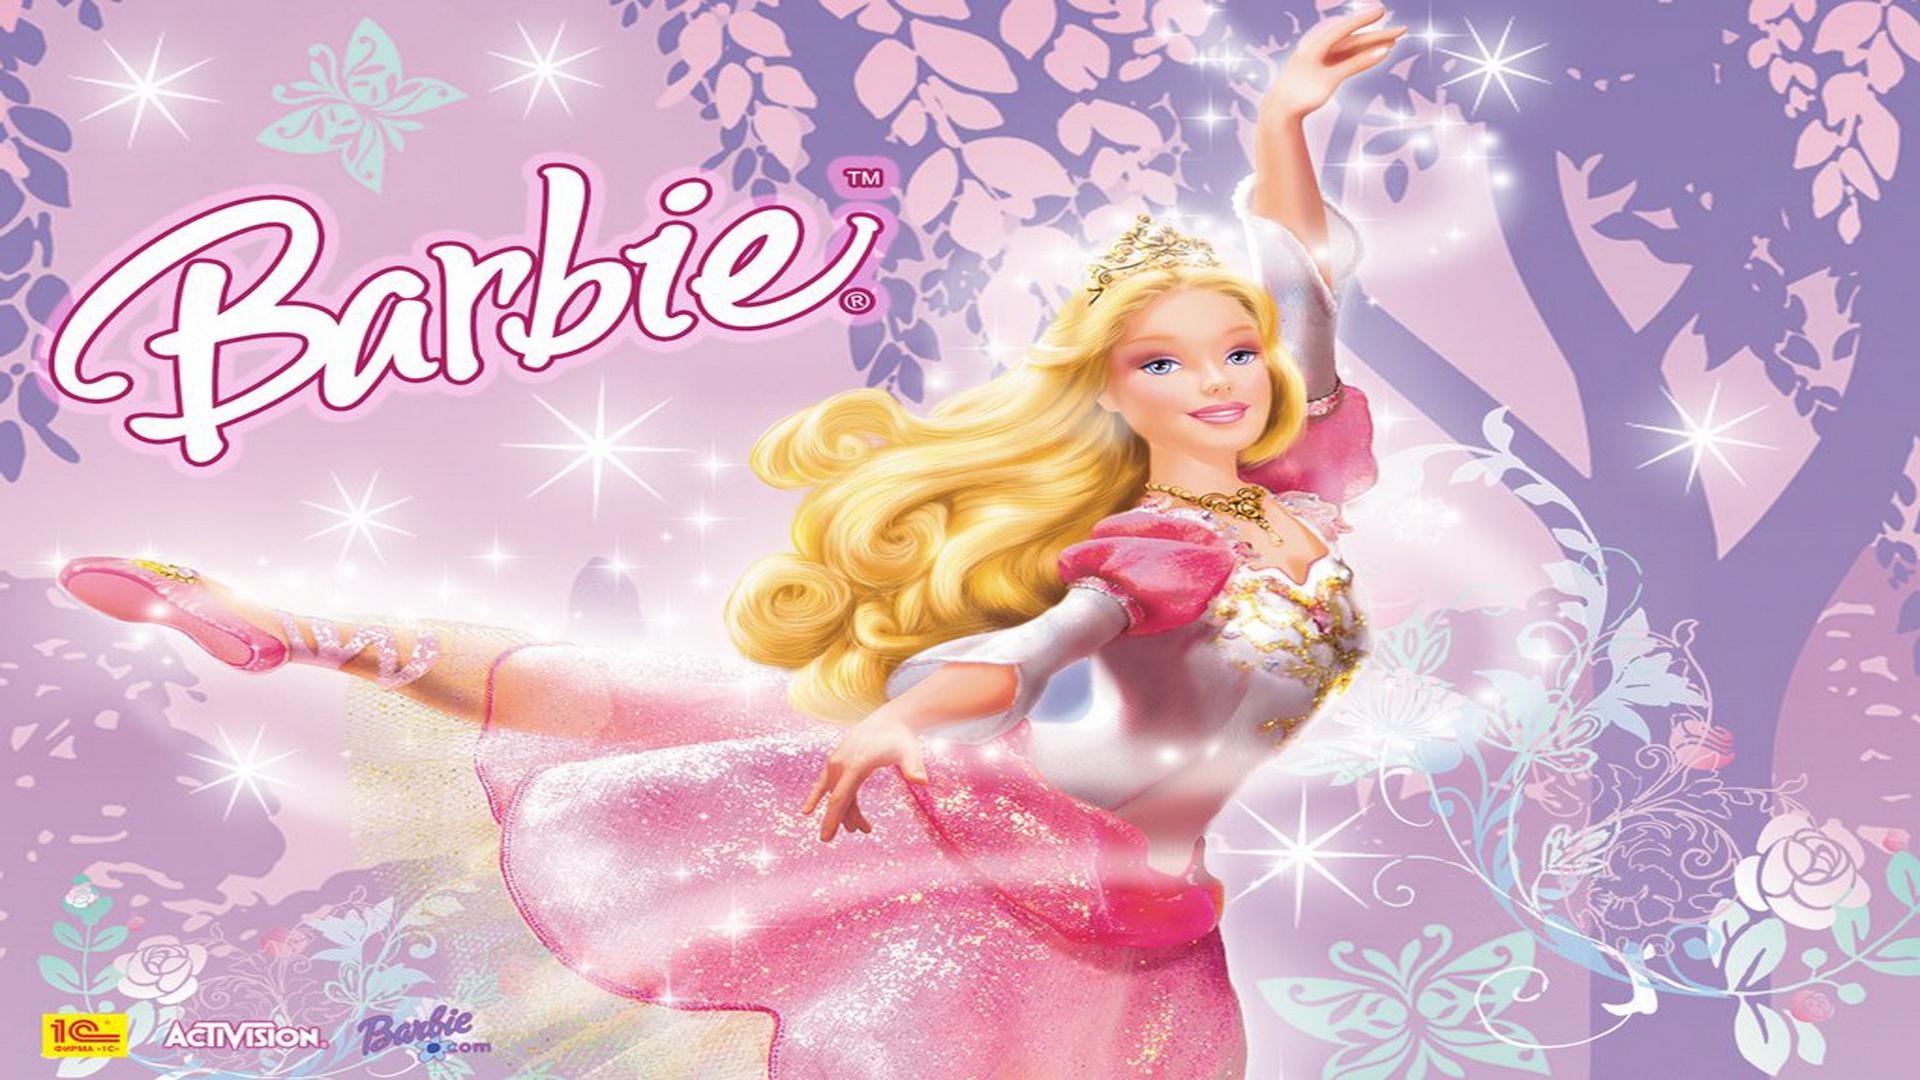 Barbie Wallpaper Hd: Barbie HD Wallpapers